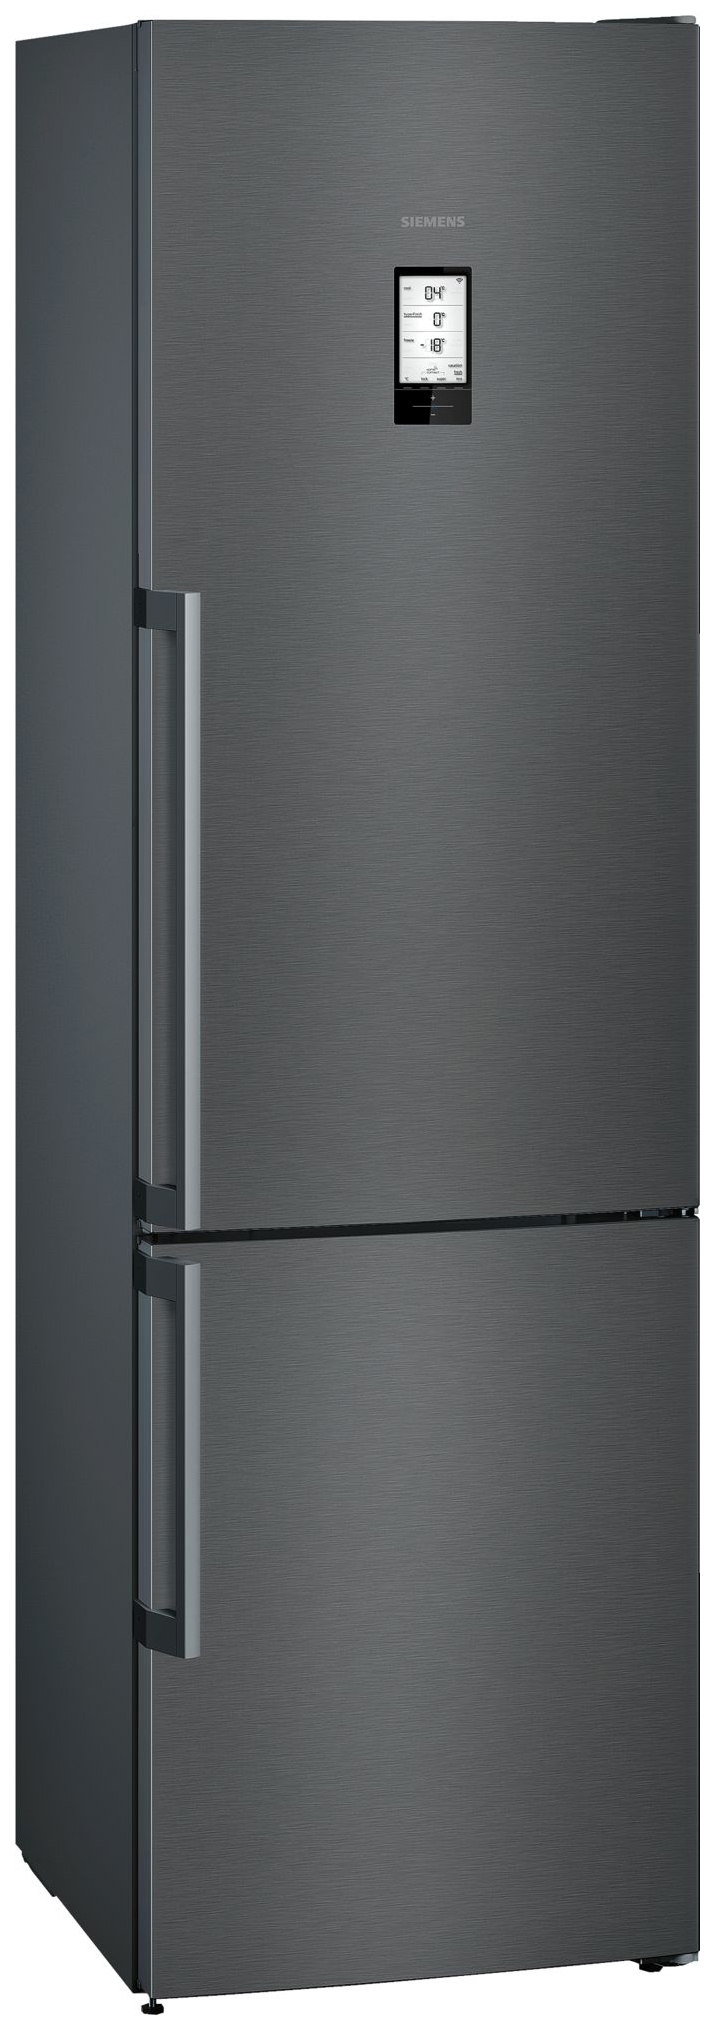 Холодильник Siemens KG39FPX3OR Black